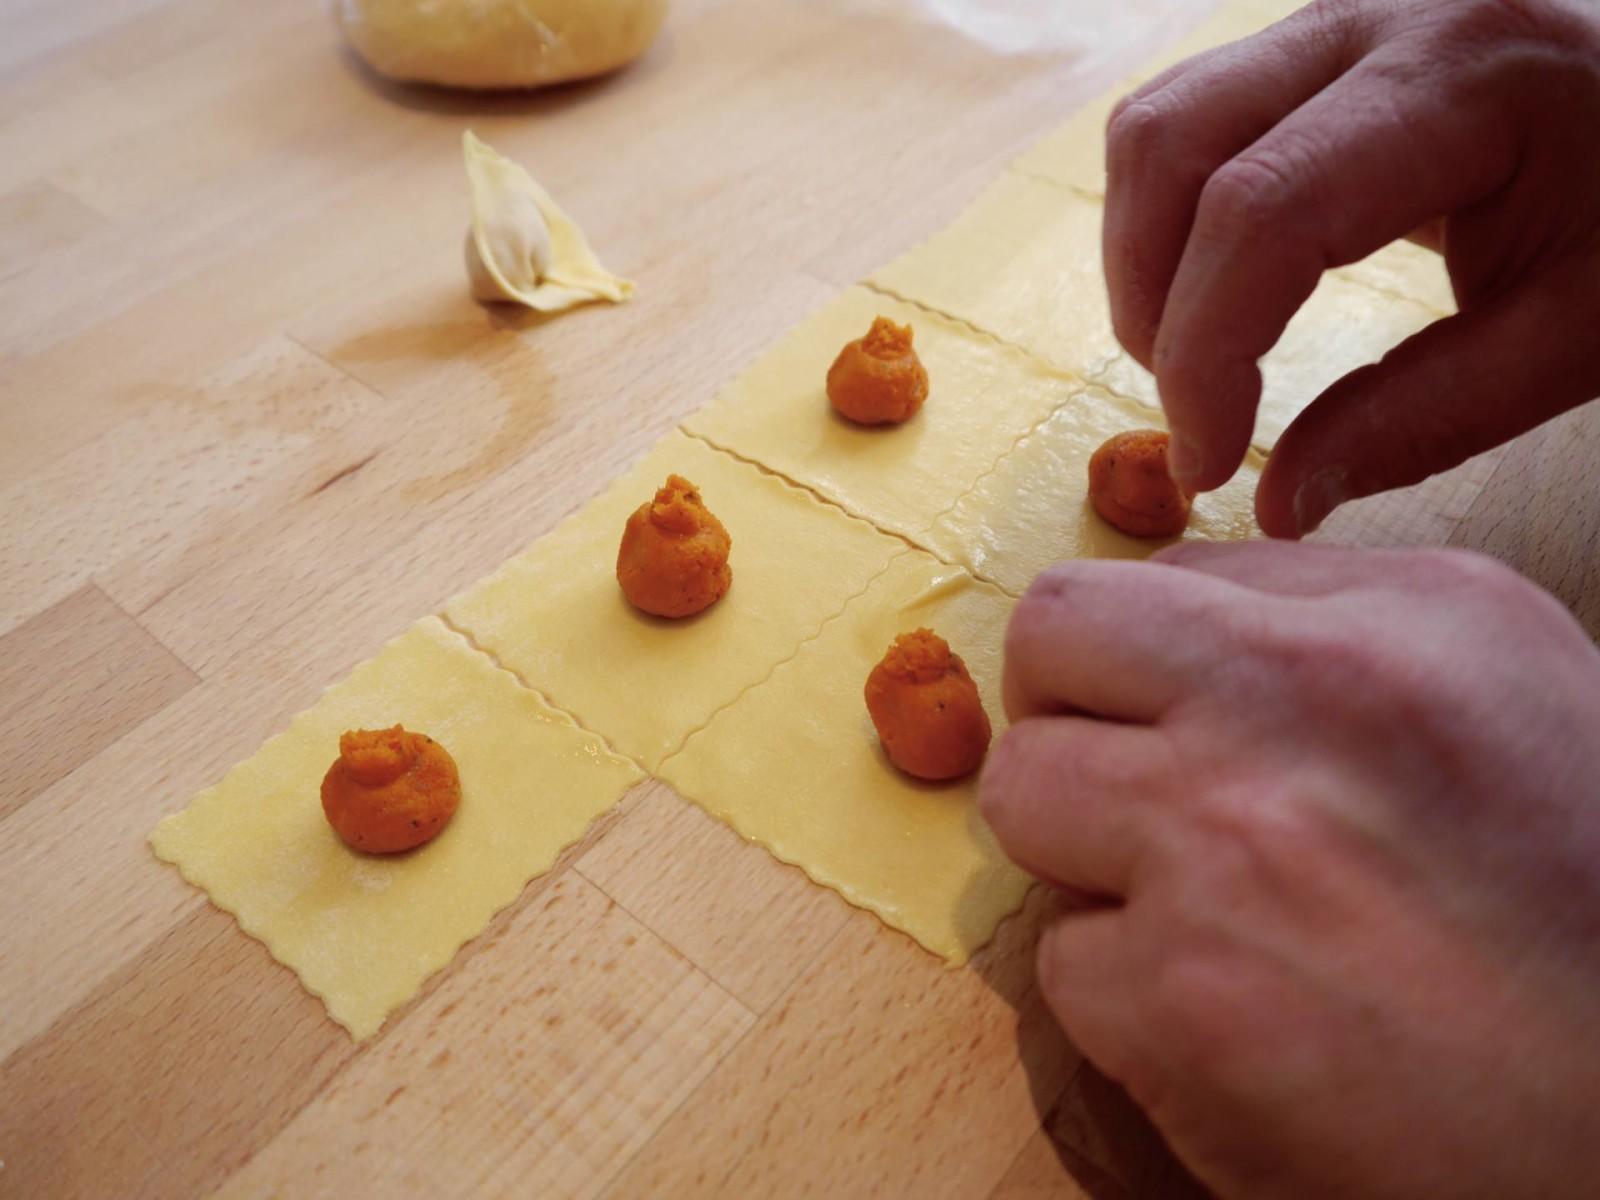 la-cucina-caldesi-cookery-school16